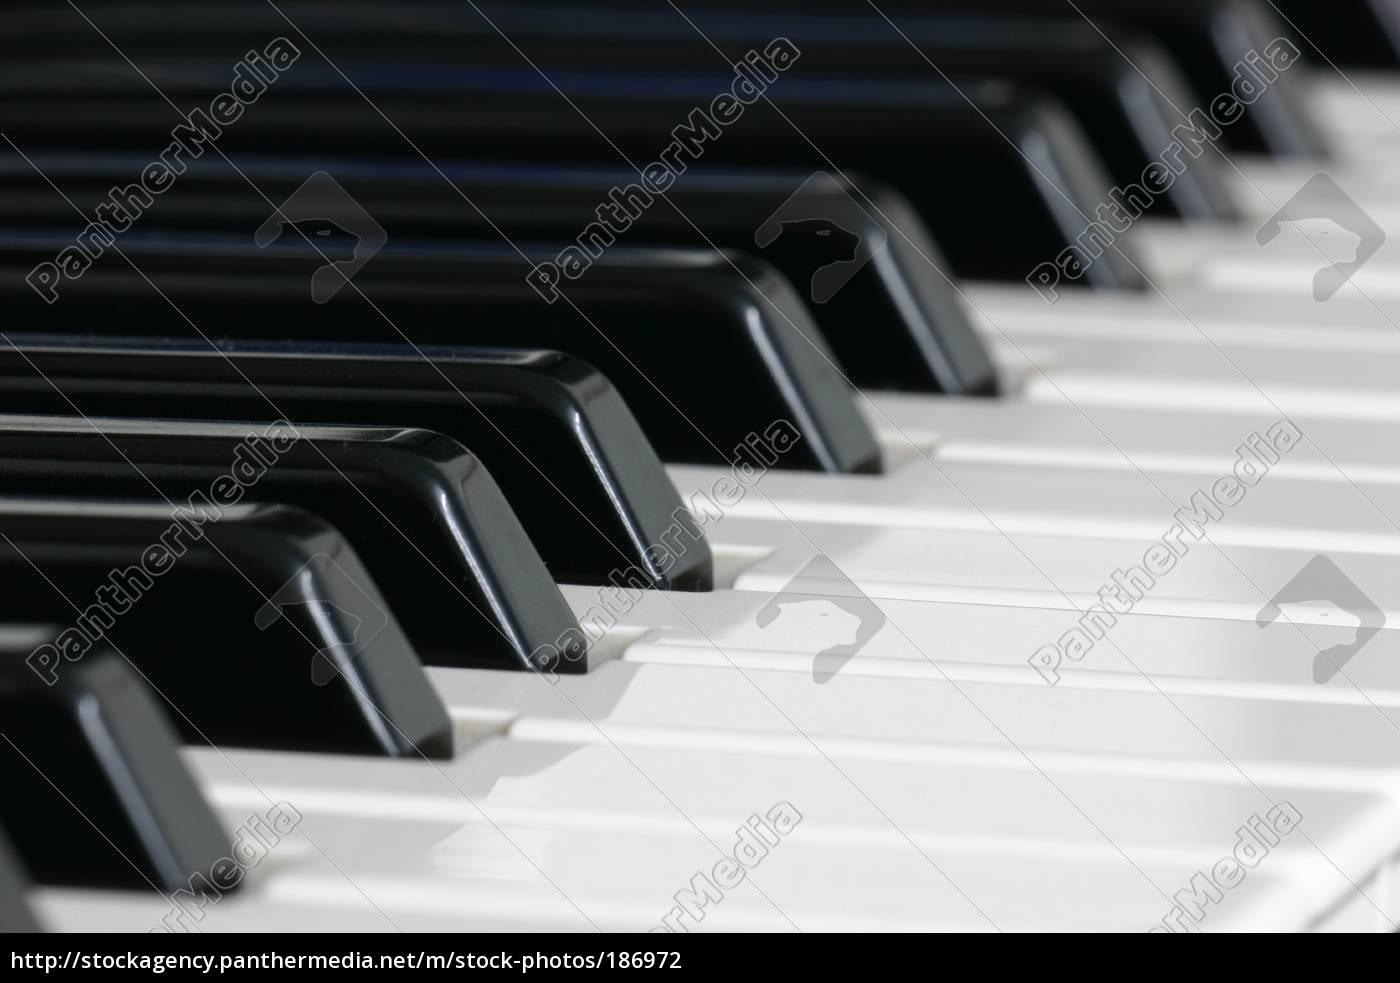 keyboard - 186972